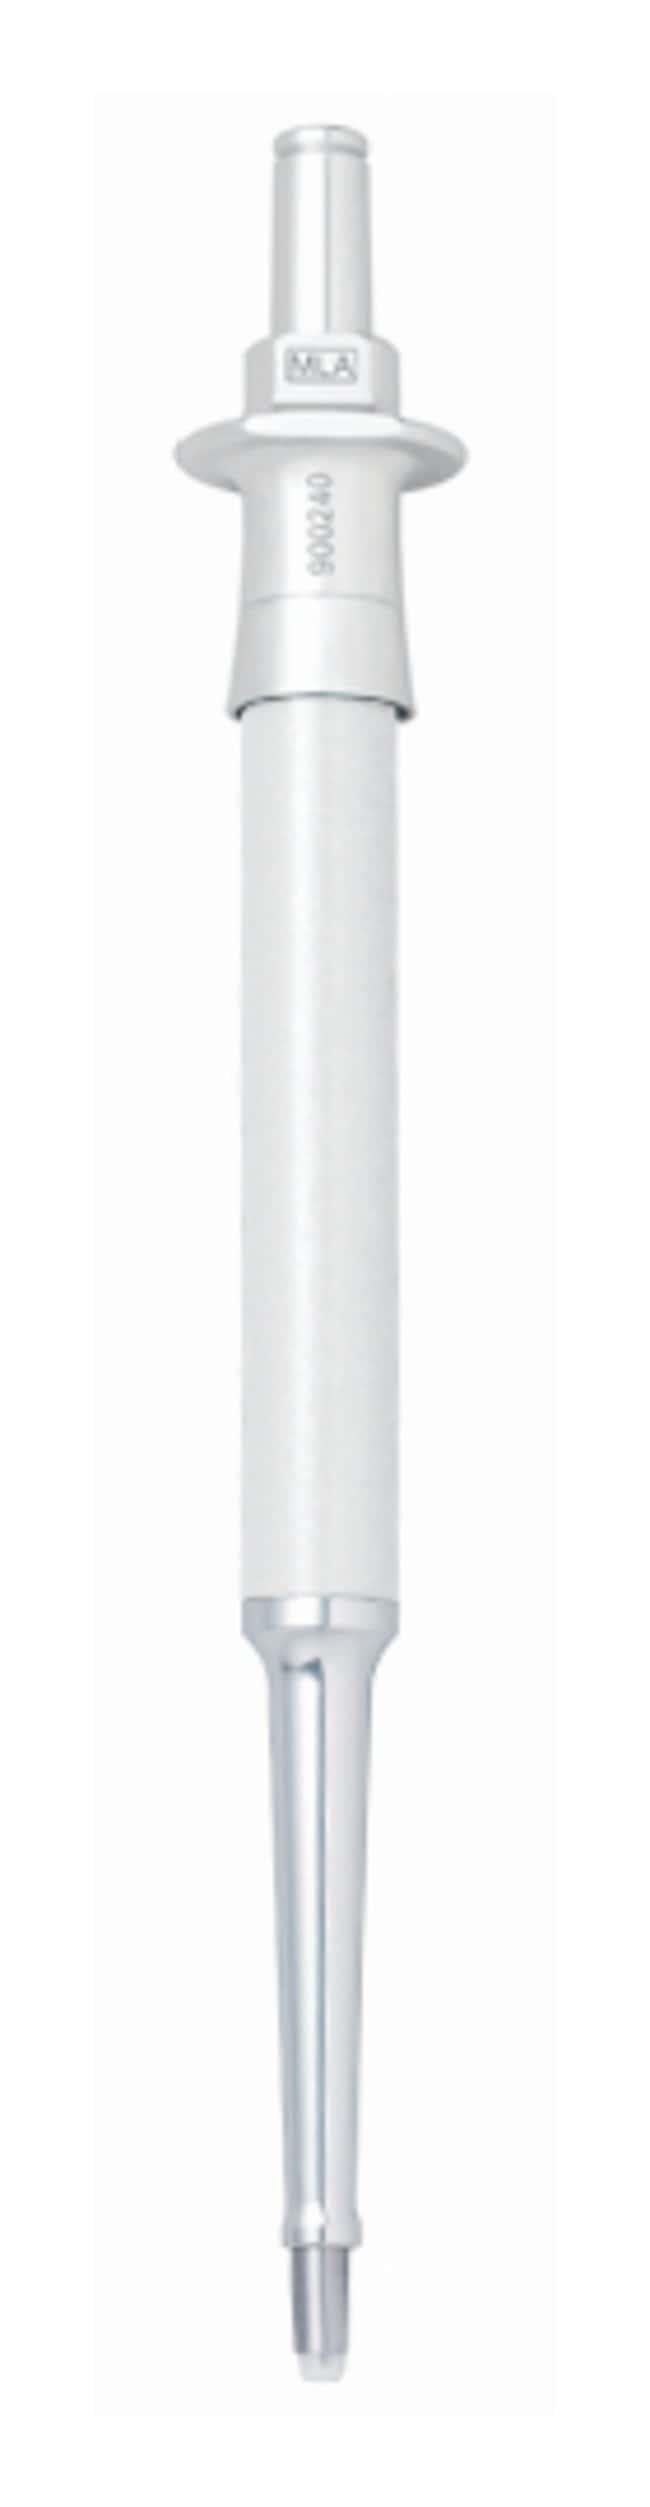 VistaLab™ TechnologiesMLA™ D-Tipper™ Pipetters Accuracy: 3.00%, Precision: 1.12%, Volume: 25 μL, Color: White VistaLab™ TechnologiesMLA™ D-Tipper™ Pipetters